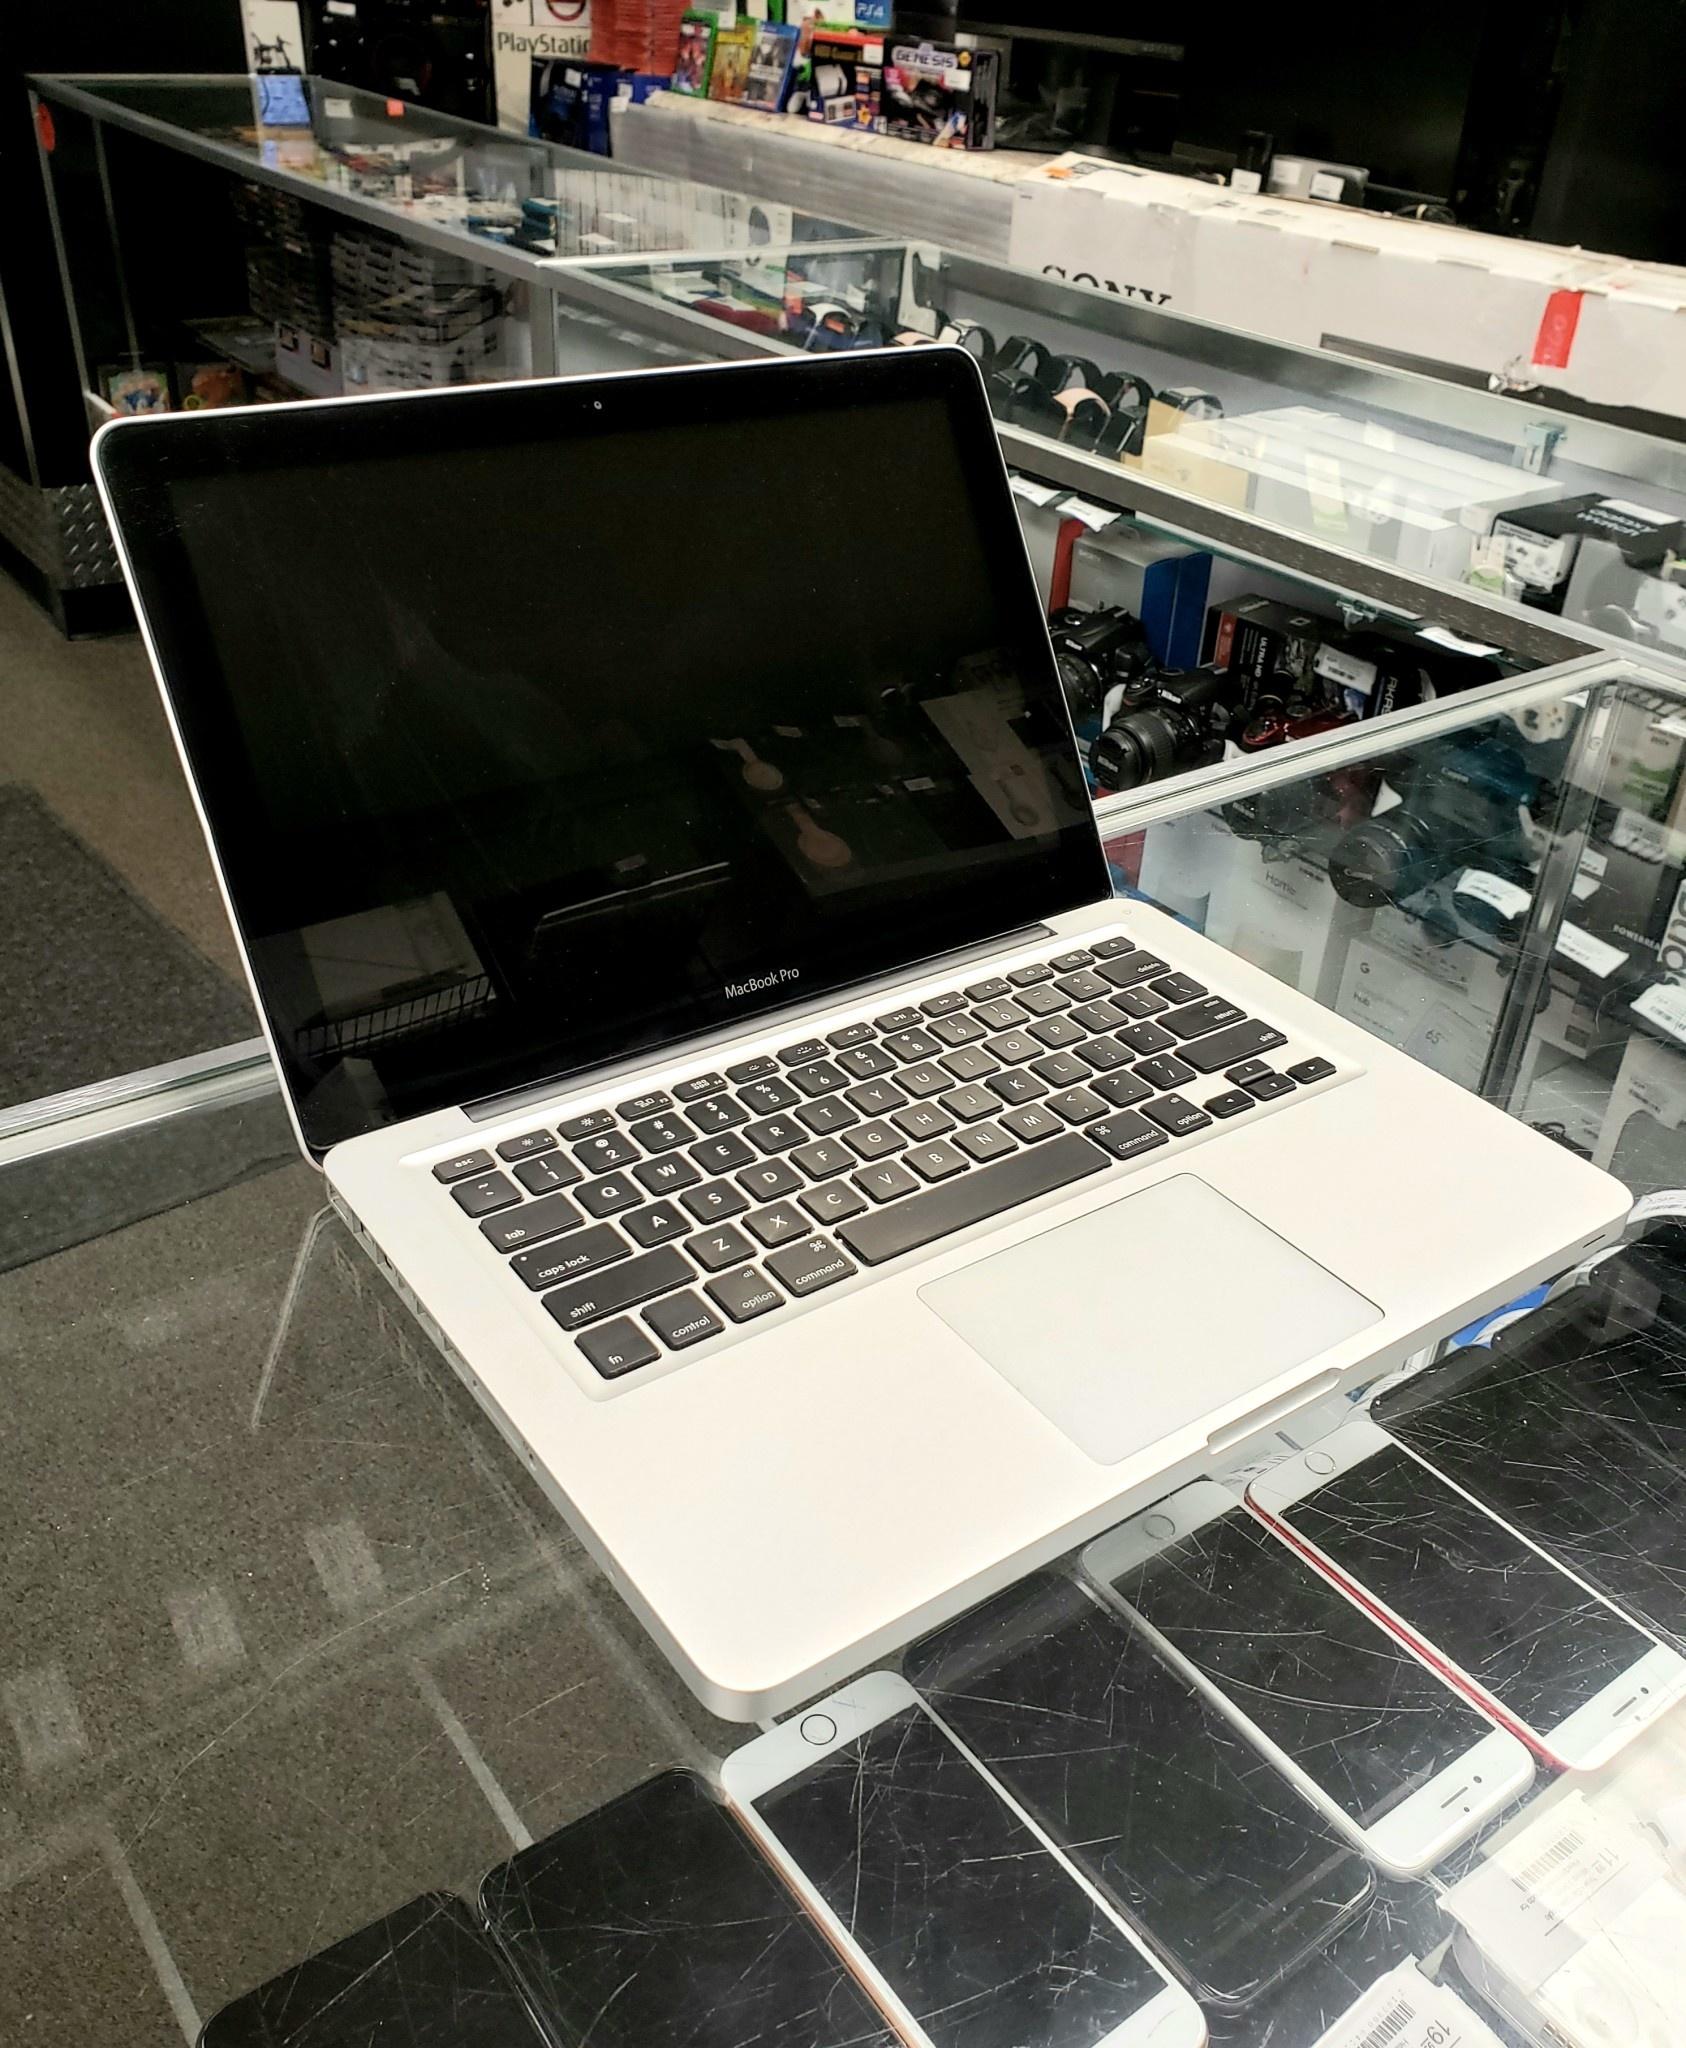 "Apple Macbook Pro - 13"" Early 2011 - Intel i5 2.3Ghz - 4GB RAM - 256GB SSD"